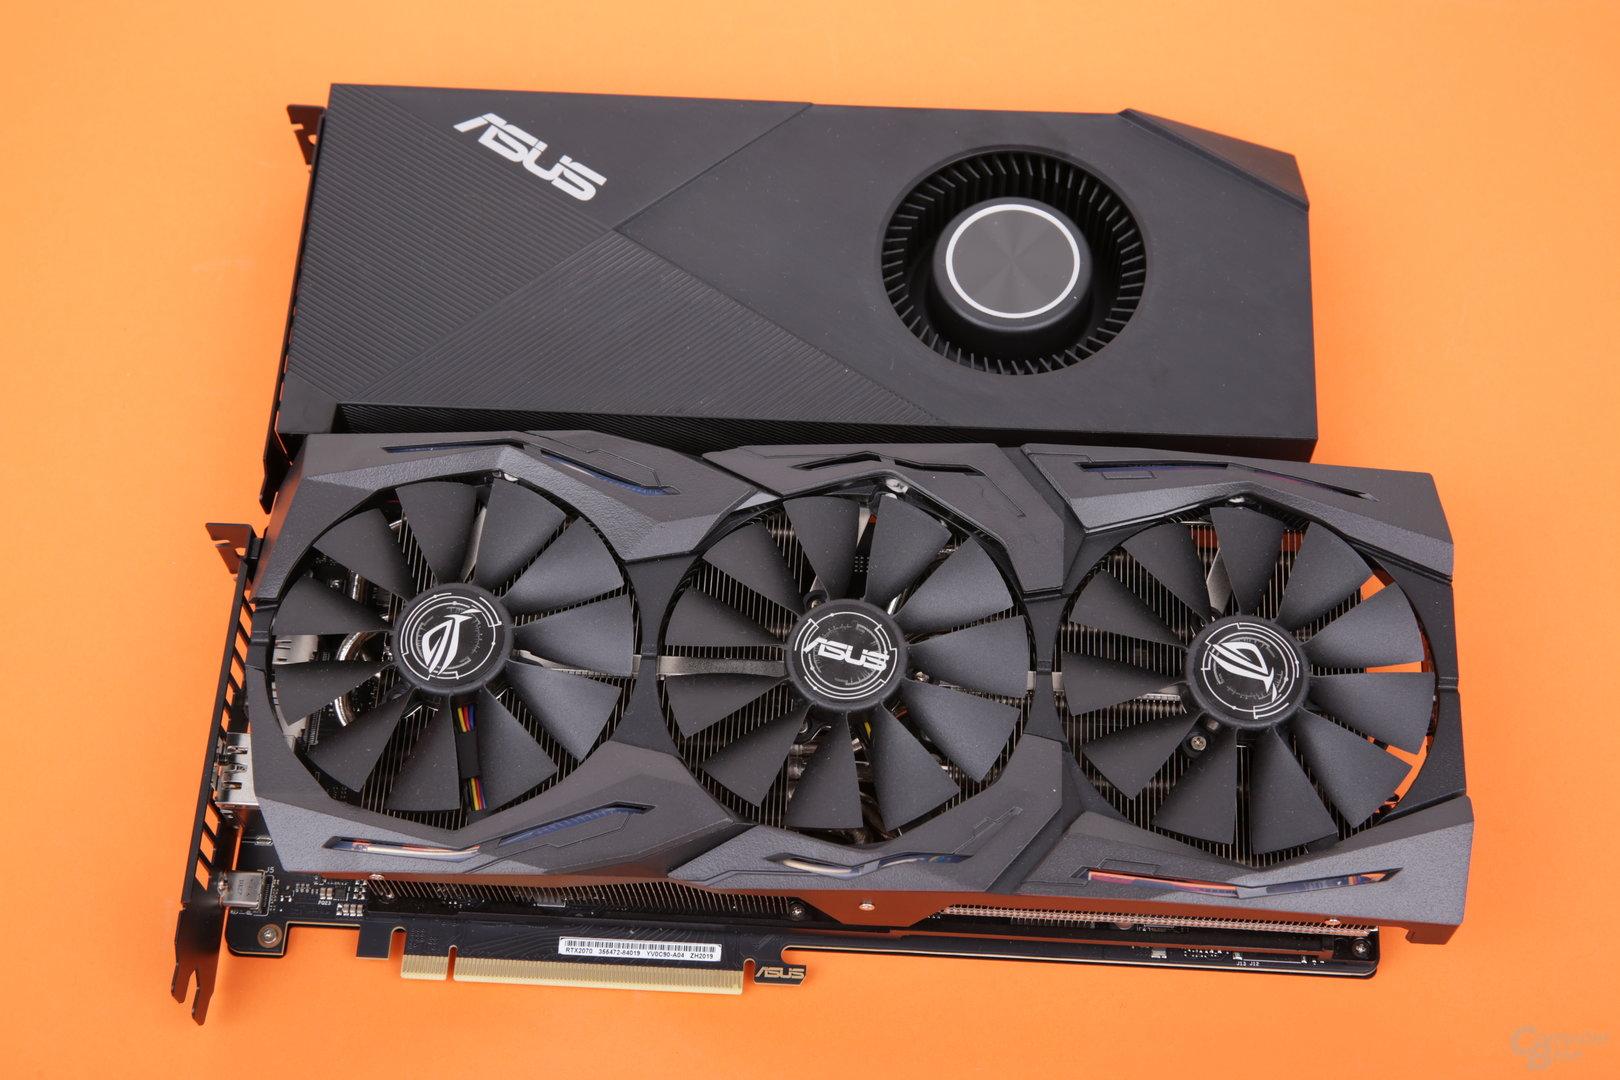 Asus GeForce RTX 2070 Strix OC (unten) vs. Asus GeForce RTX 2070 Turbo (oben)